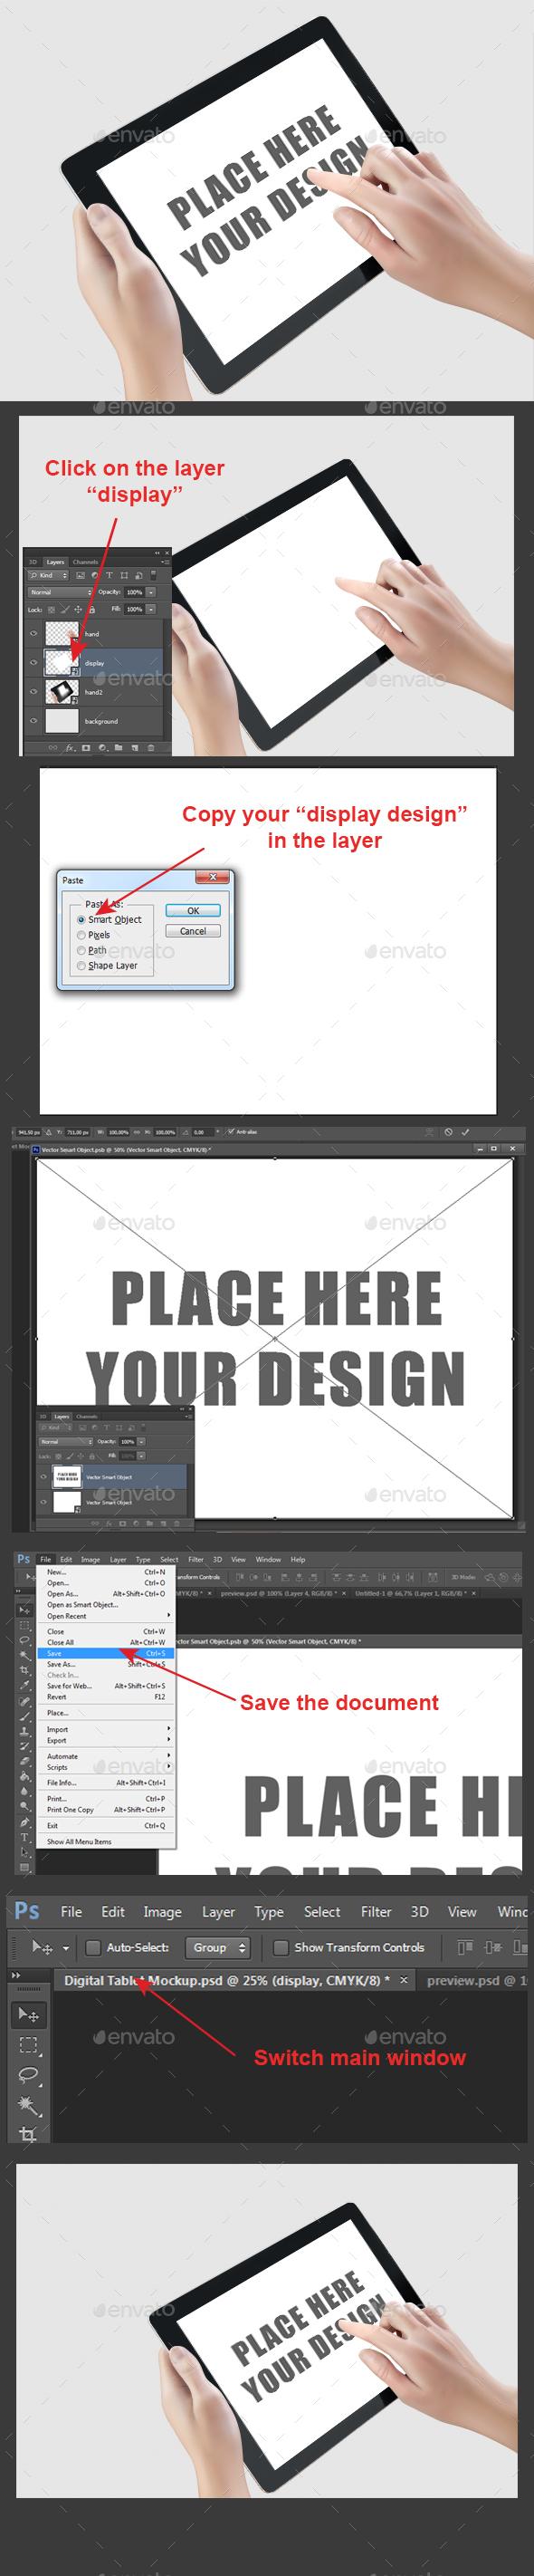 Digital Tablet Mockup - Product Mock-Ups Graphics